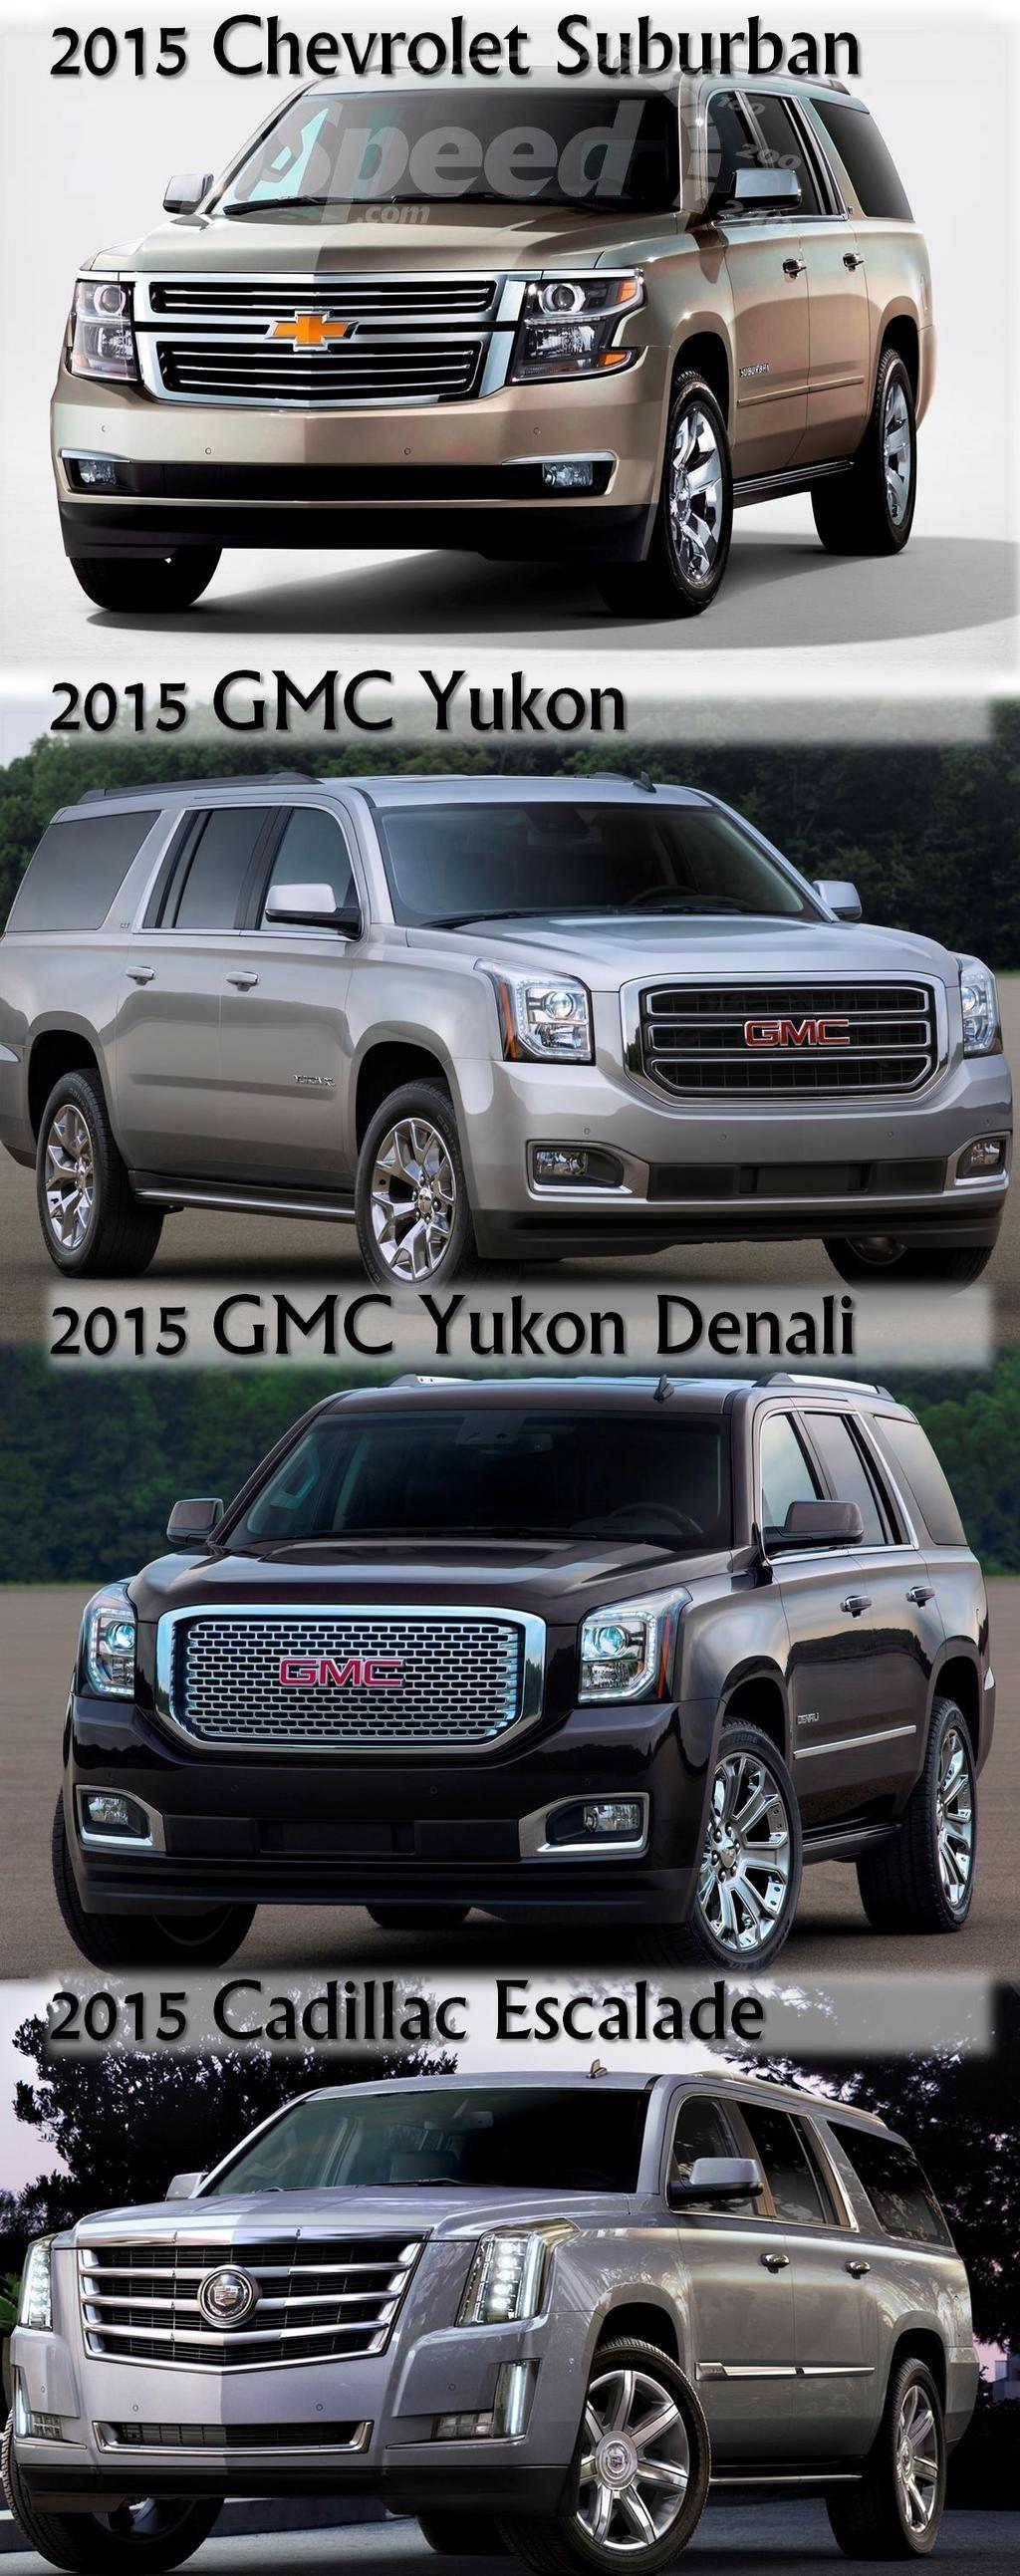 Gmc Yukon Xl 25 1024x0w Jpg 1 024 2 586 Pixels Suv Cars Gmc